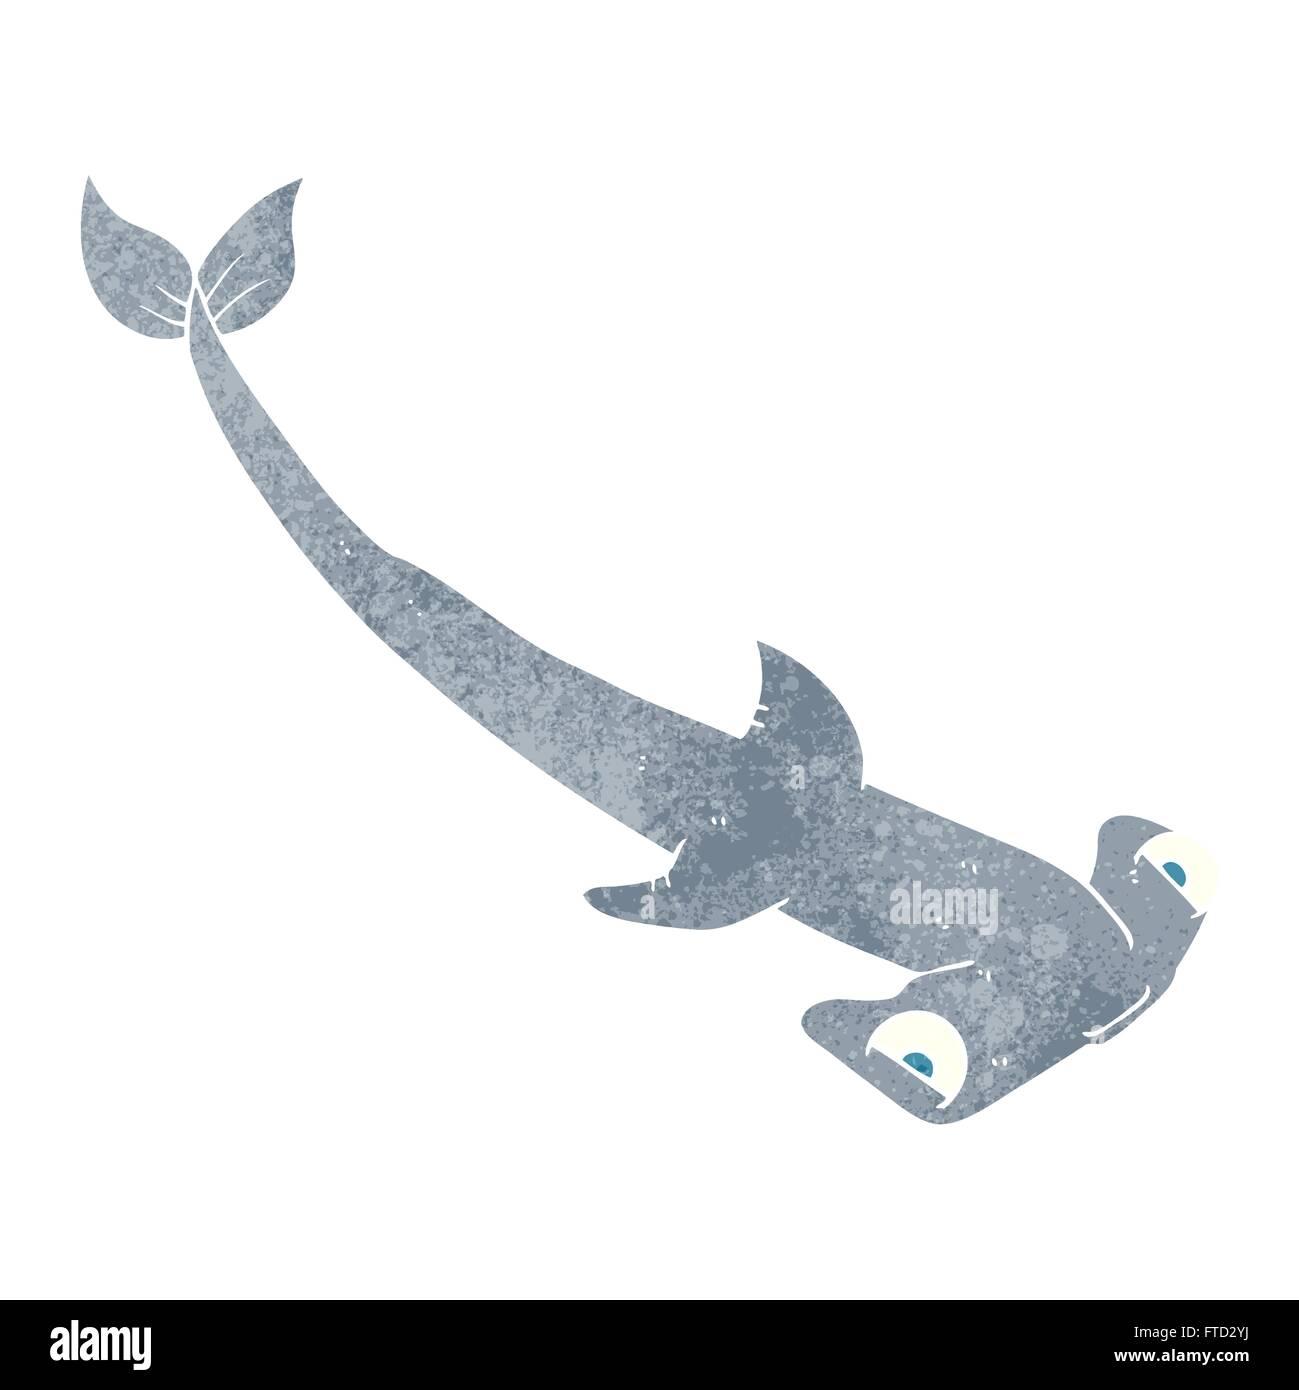 Cartoon Hammerhead Shark Stockfotos & Cartoon Hammerhead Shark ...